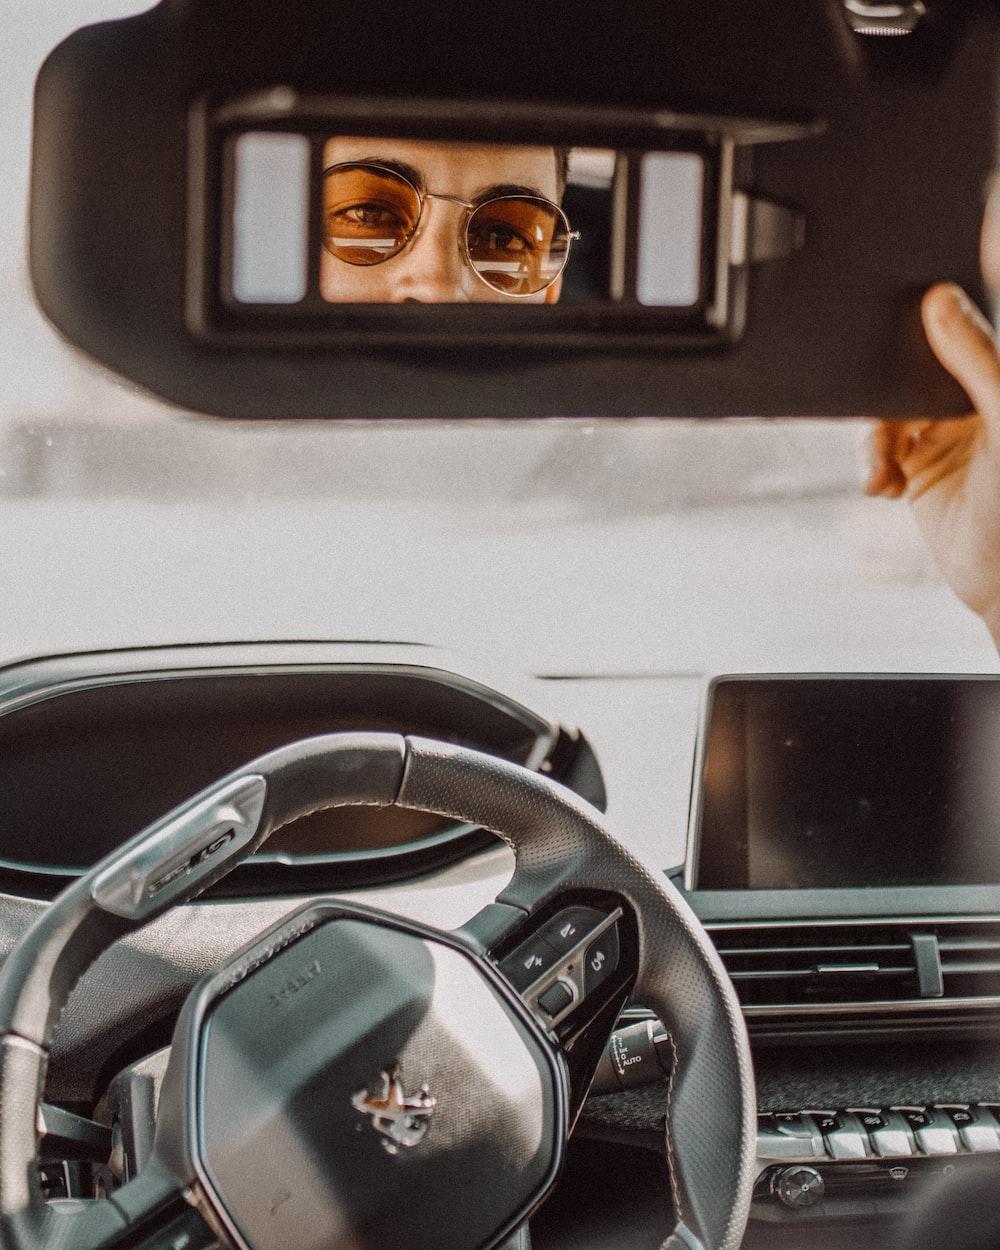 man looking through Peugeot vehicle sun shade's mirror